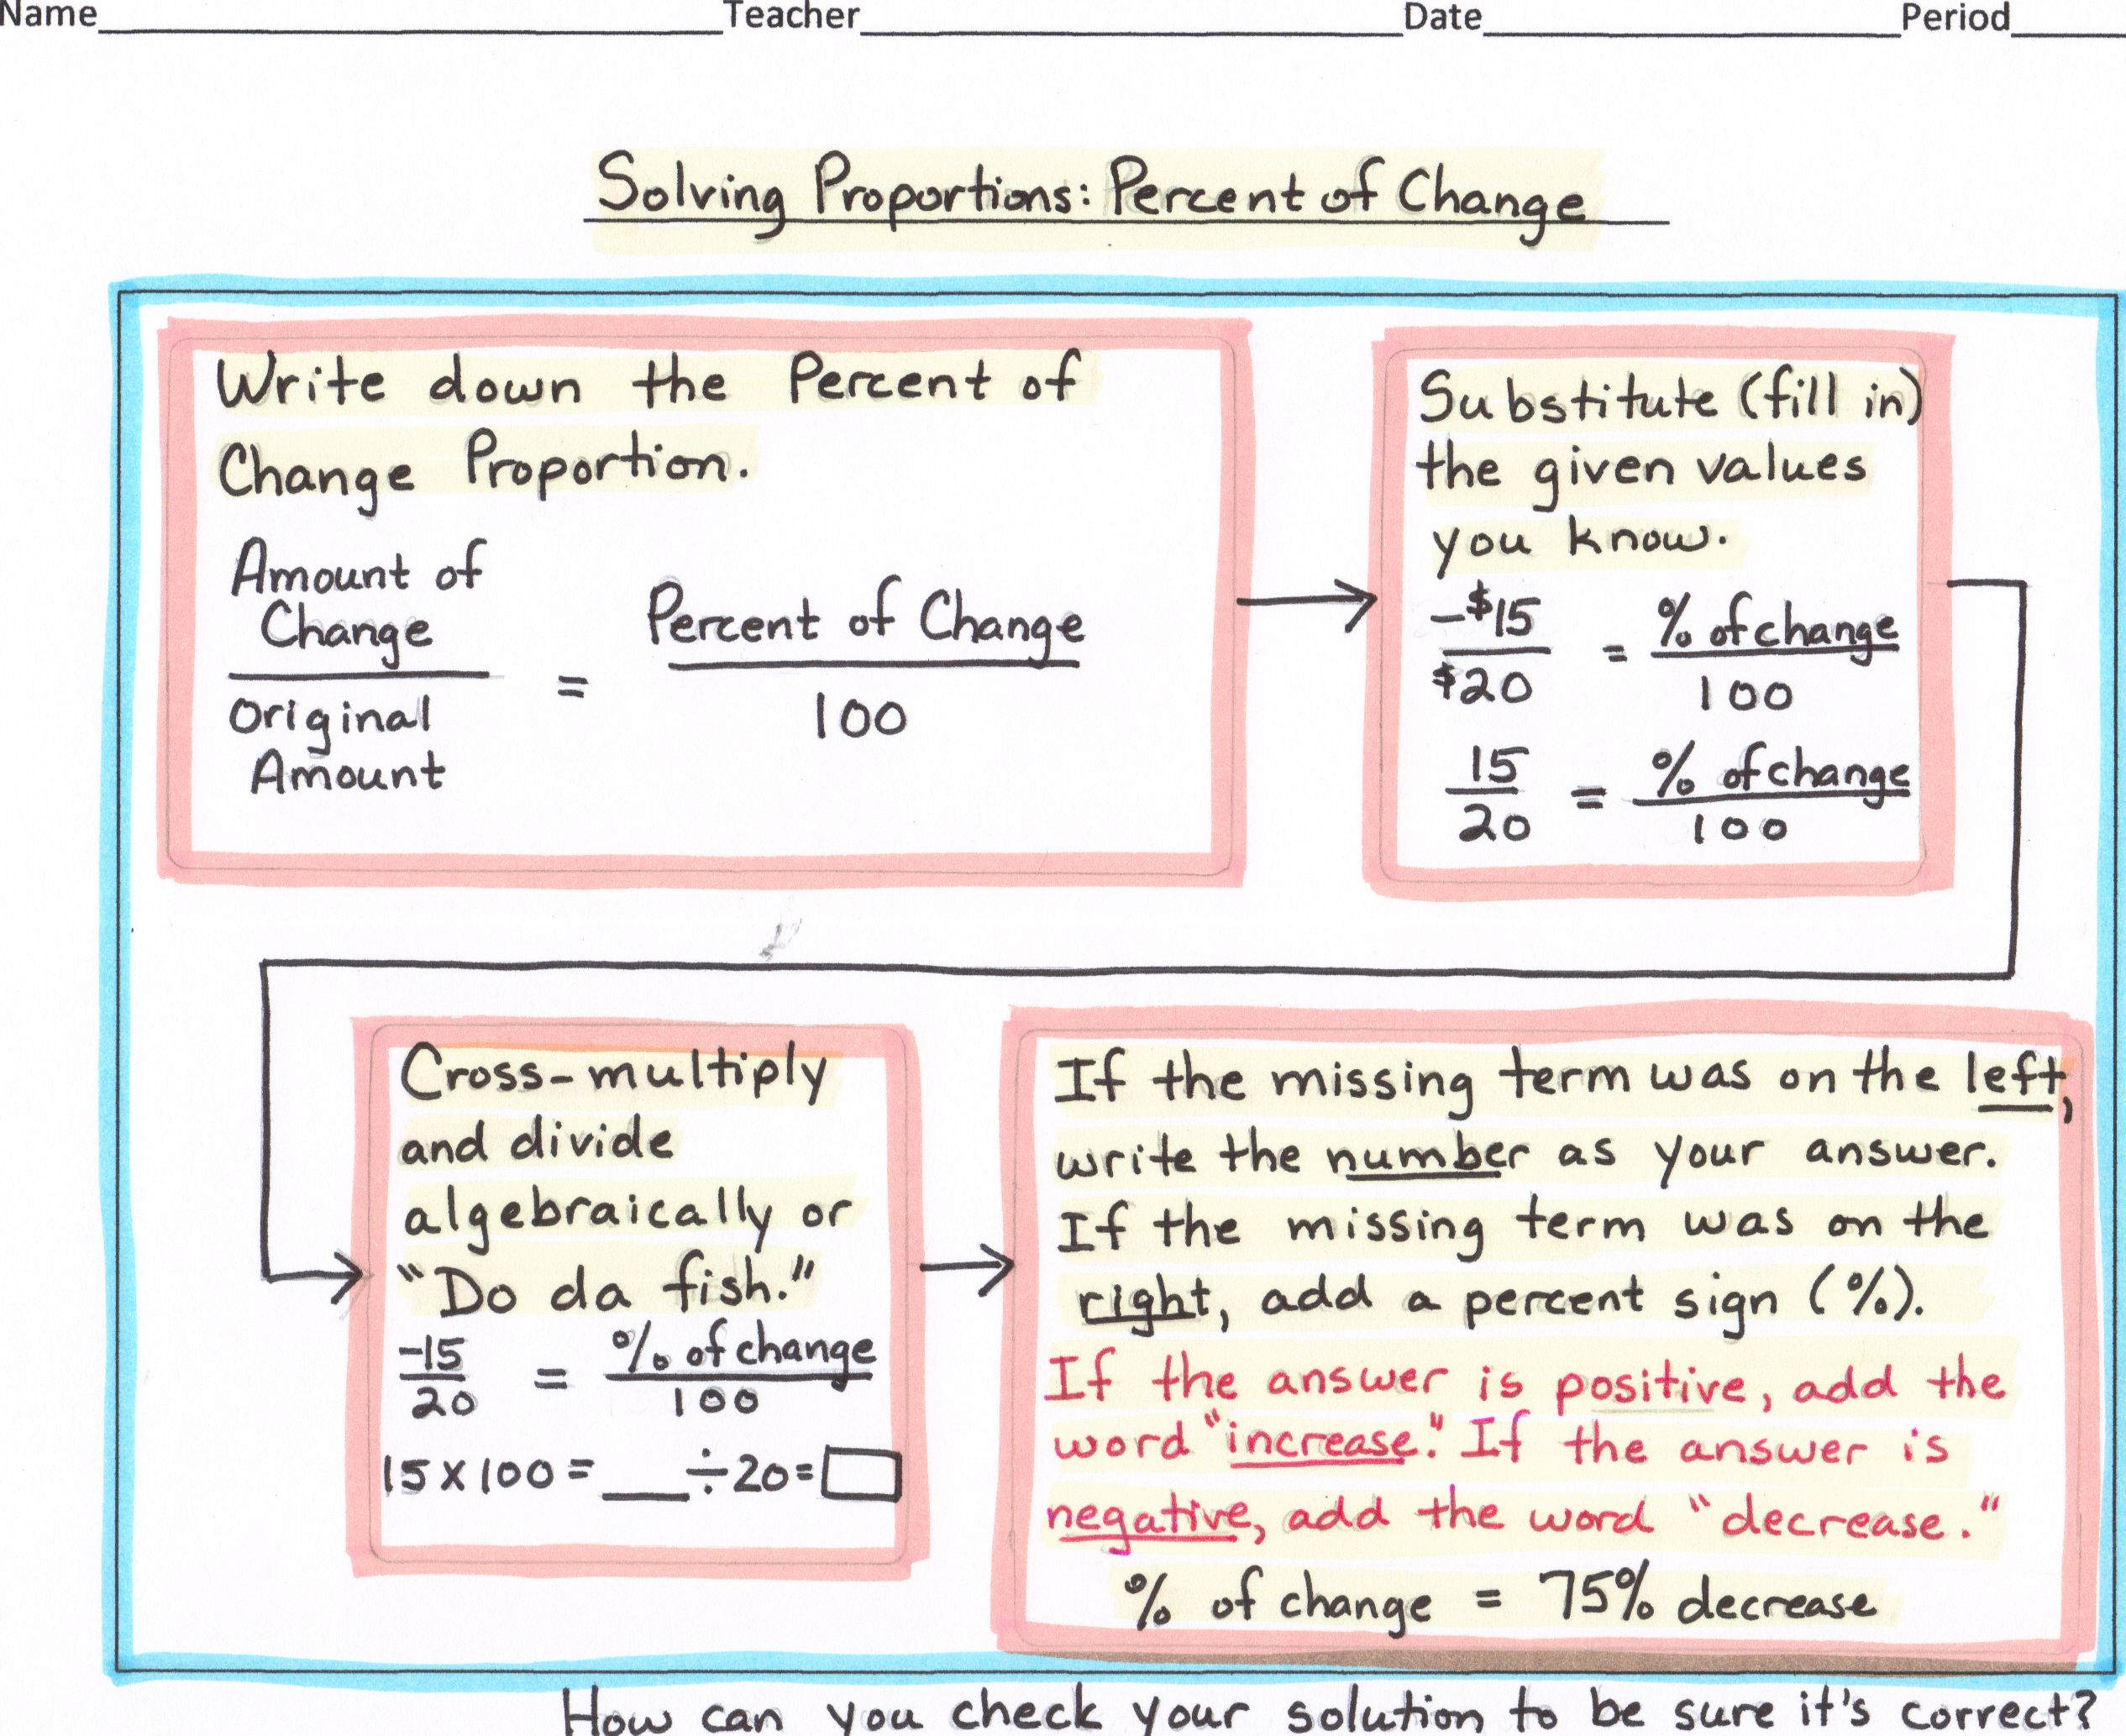 Math Algebra Flow Map Solving Proportions Percent Of Change Percent Of Change Thinking Maps Thinking Maps Math